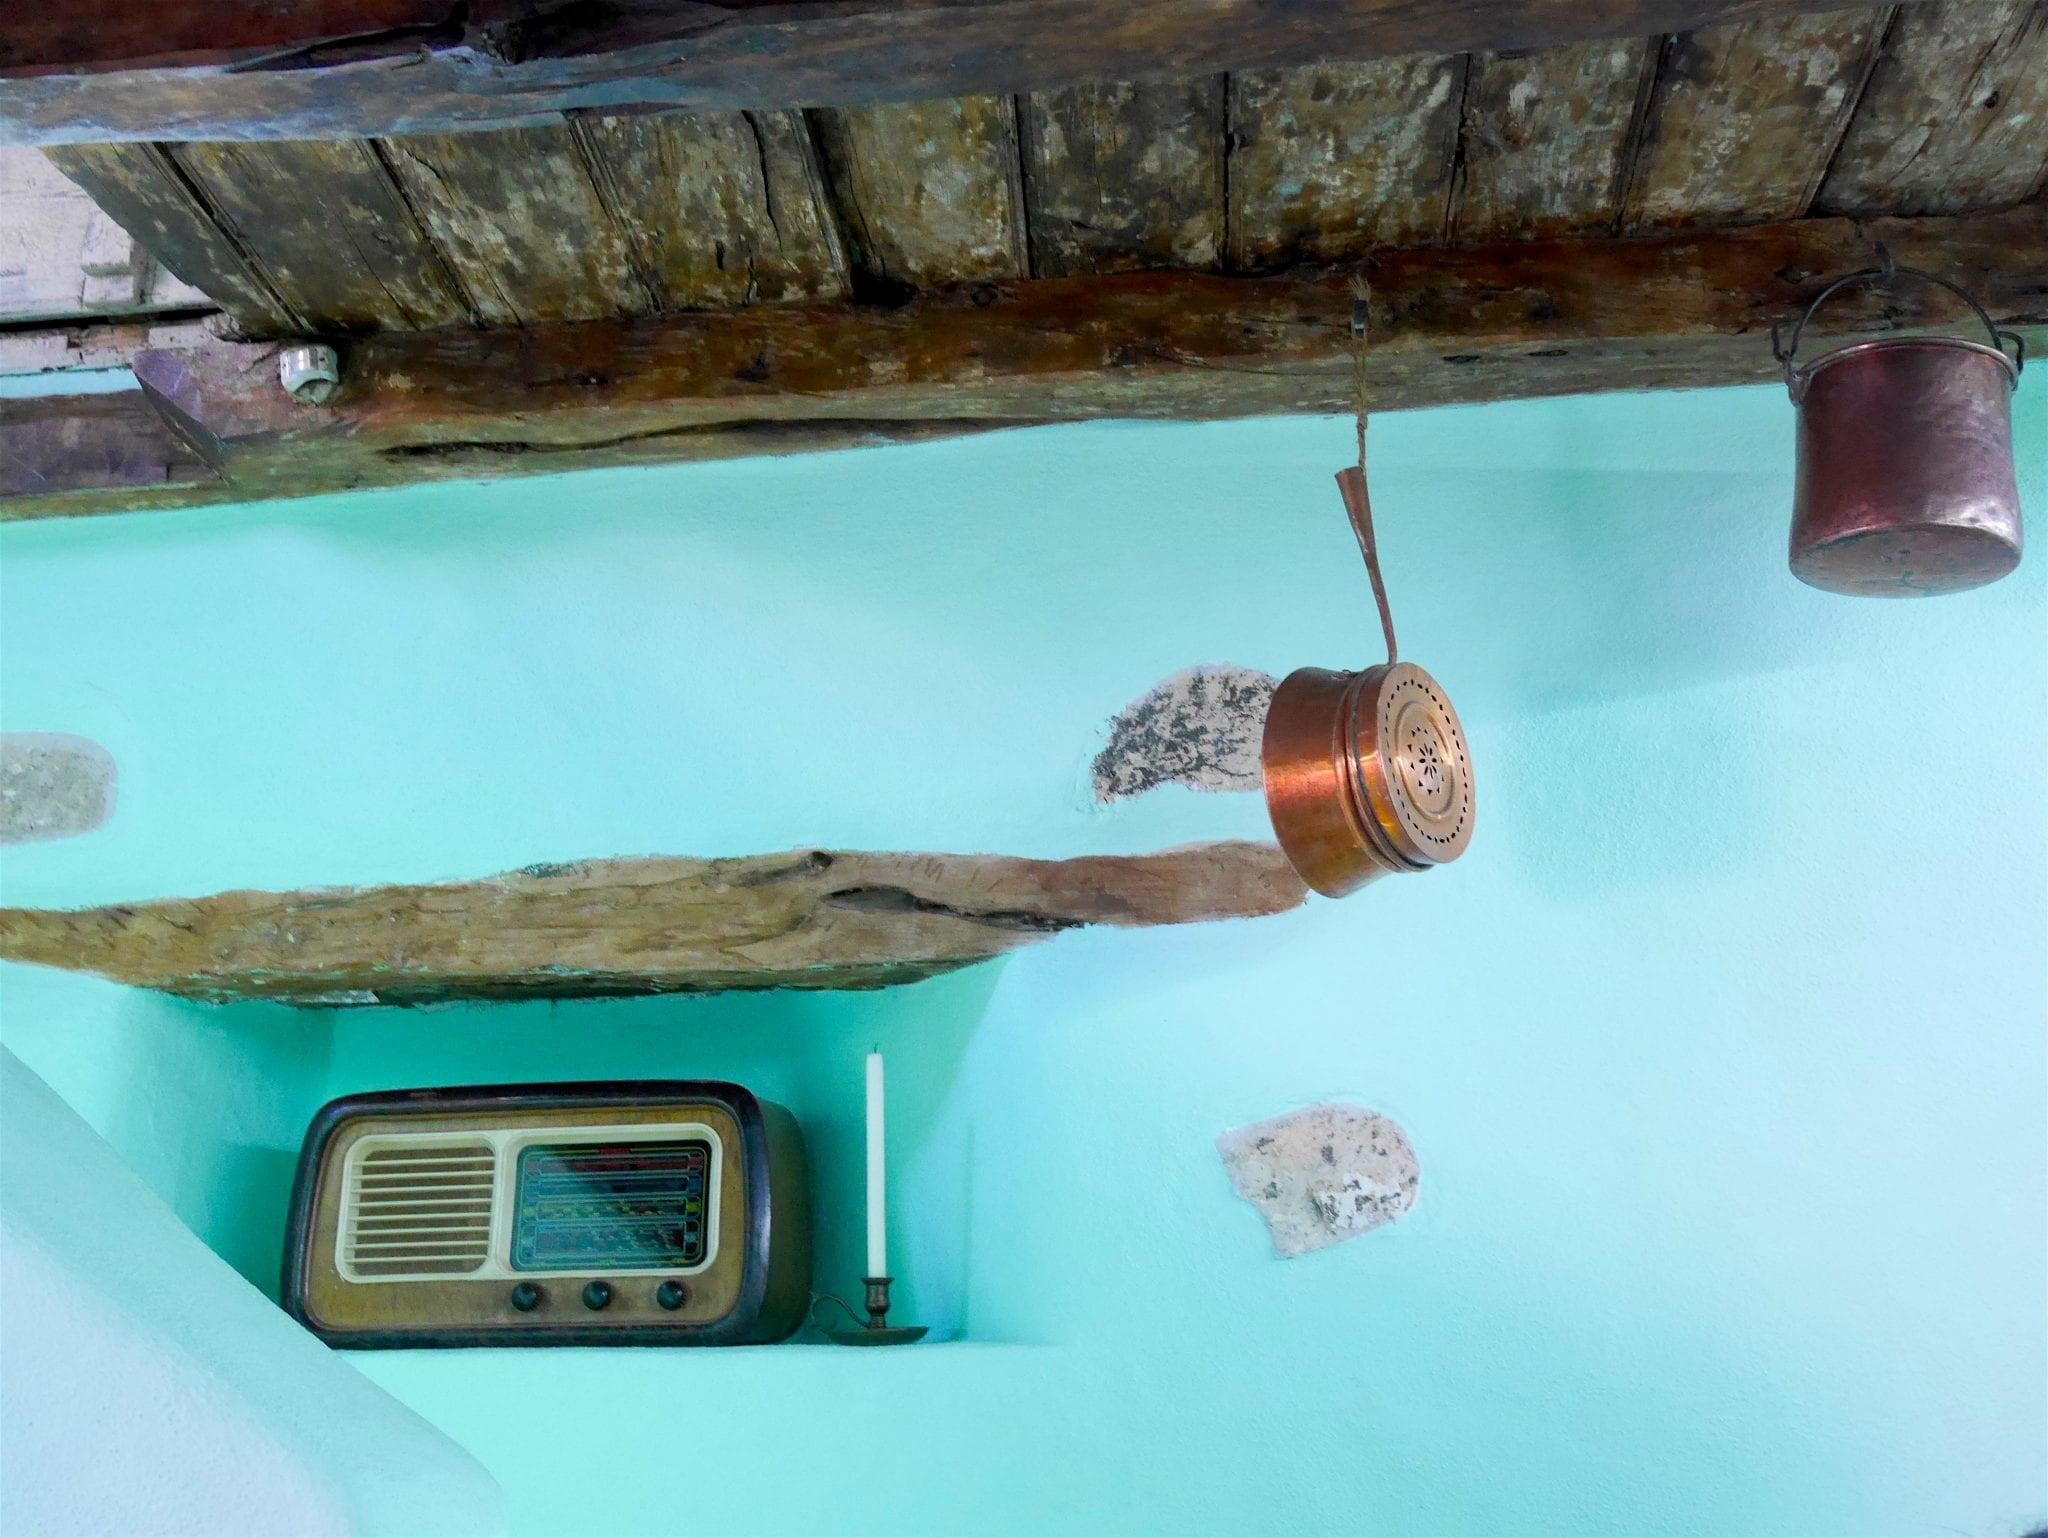 Museo del pane carasau orgosolo - le plume